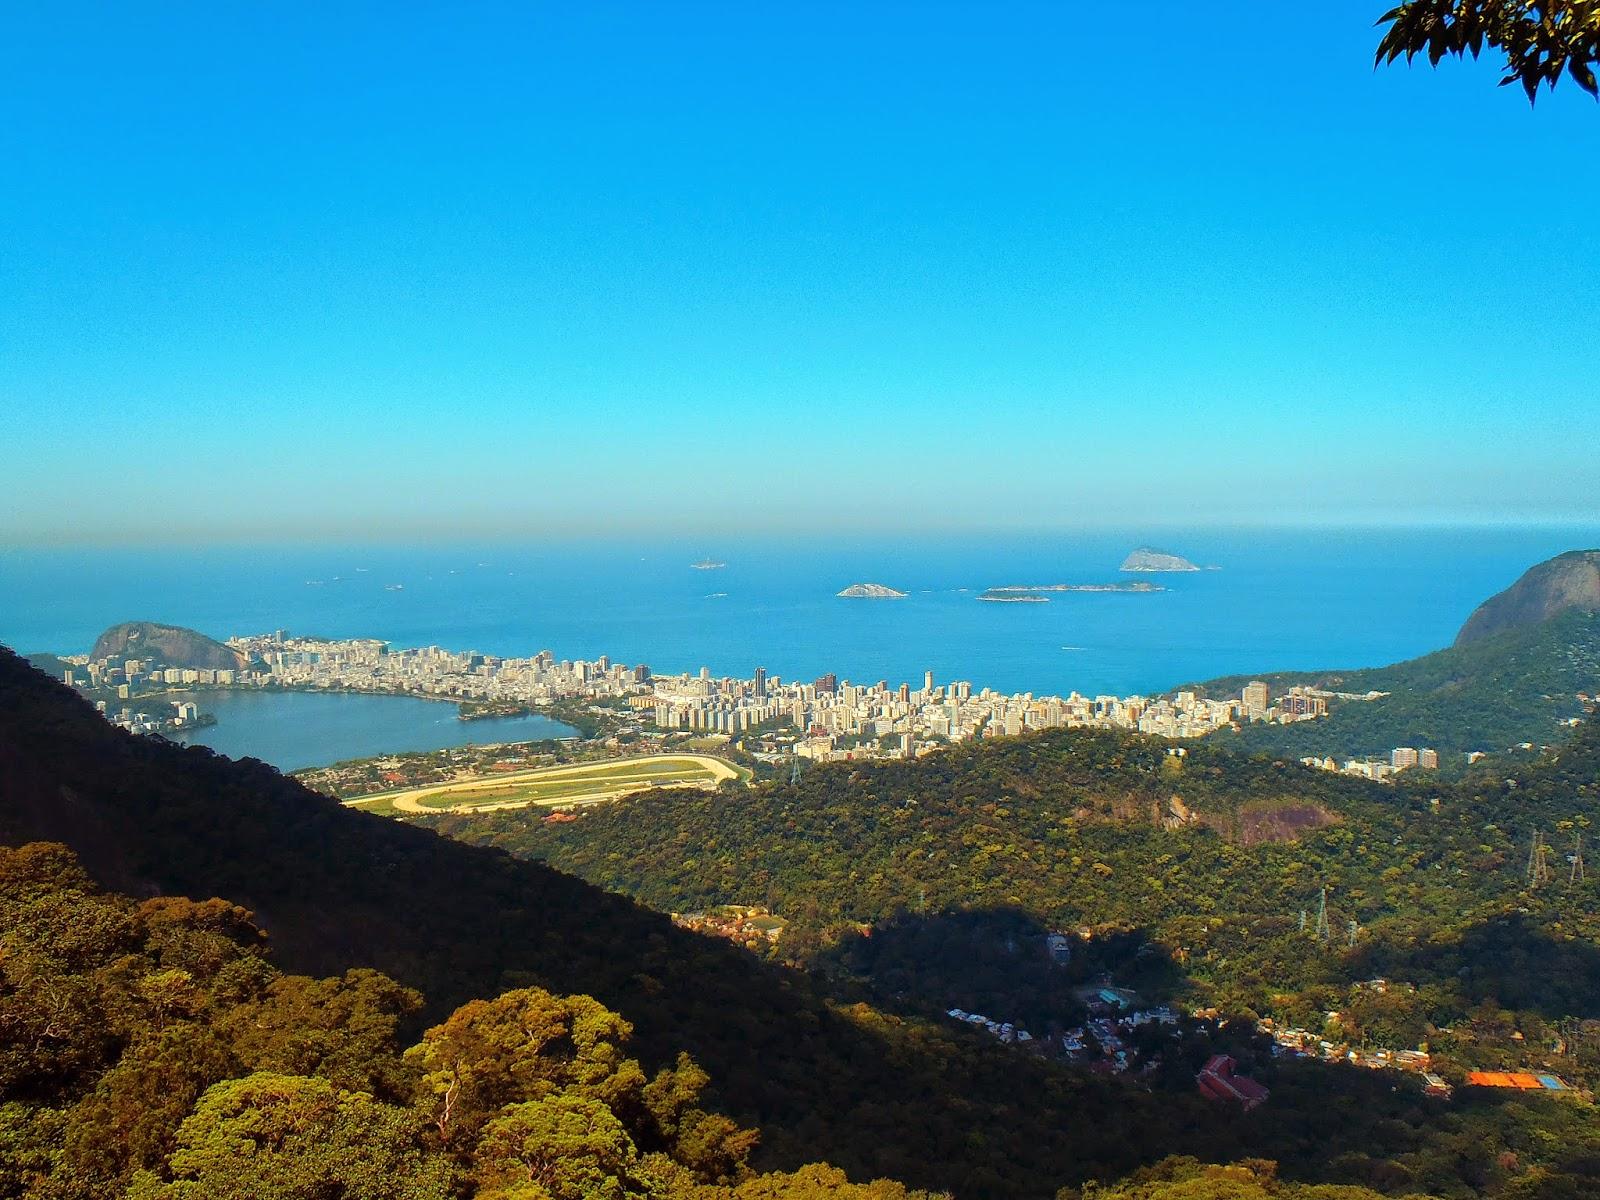 View of Rio de Janeiro from Tijuca National Park